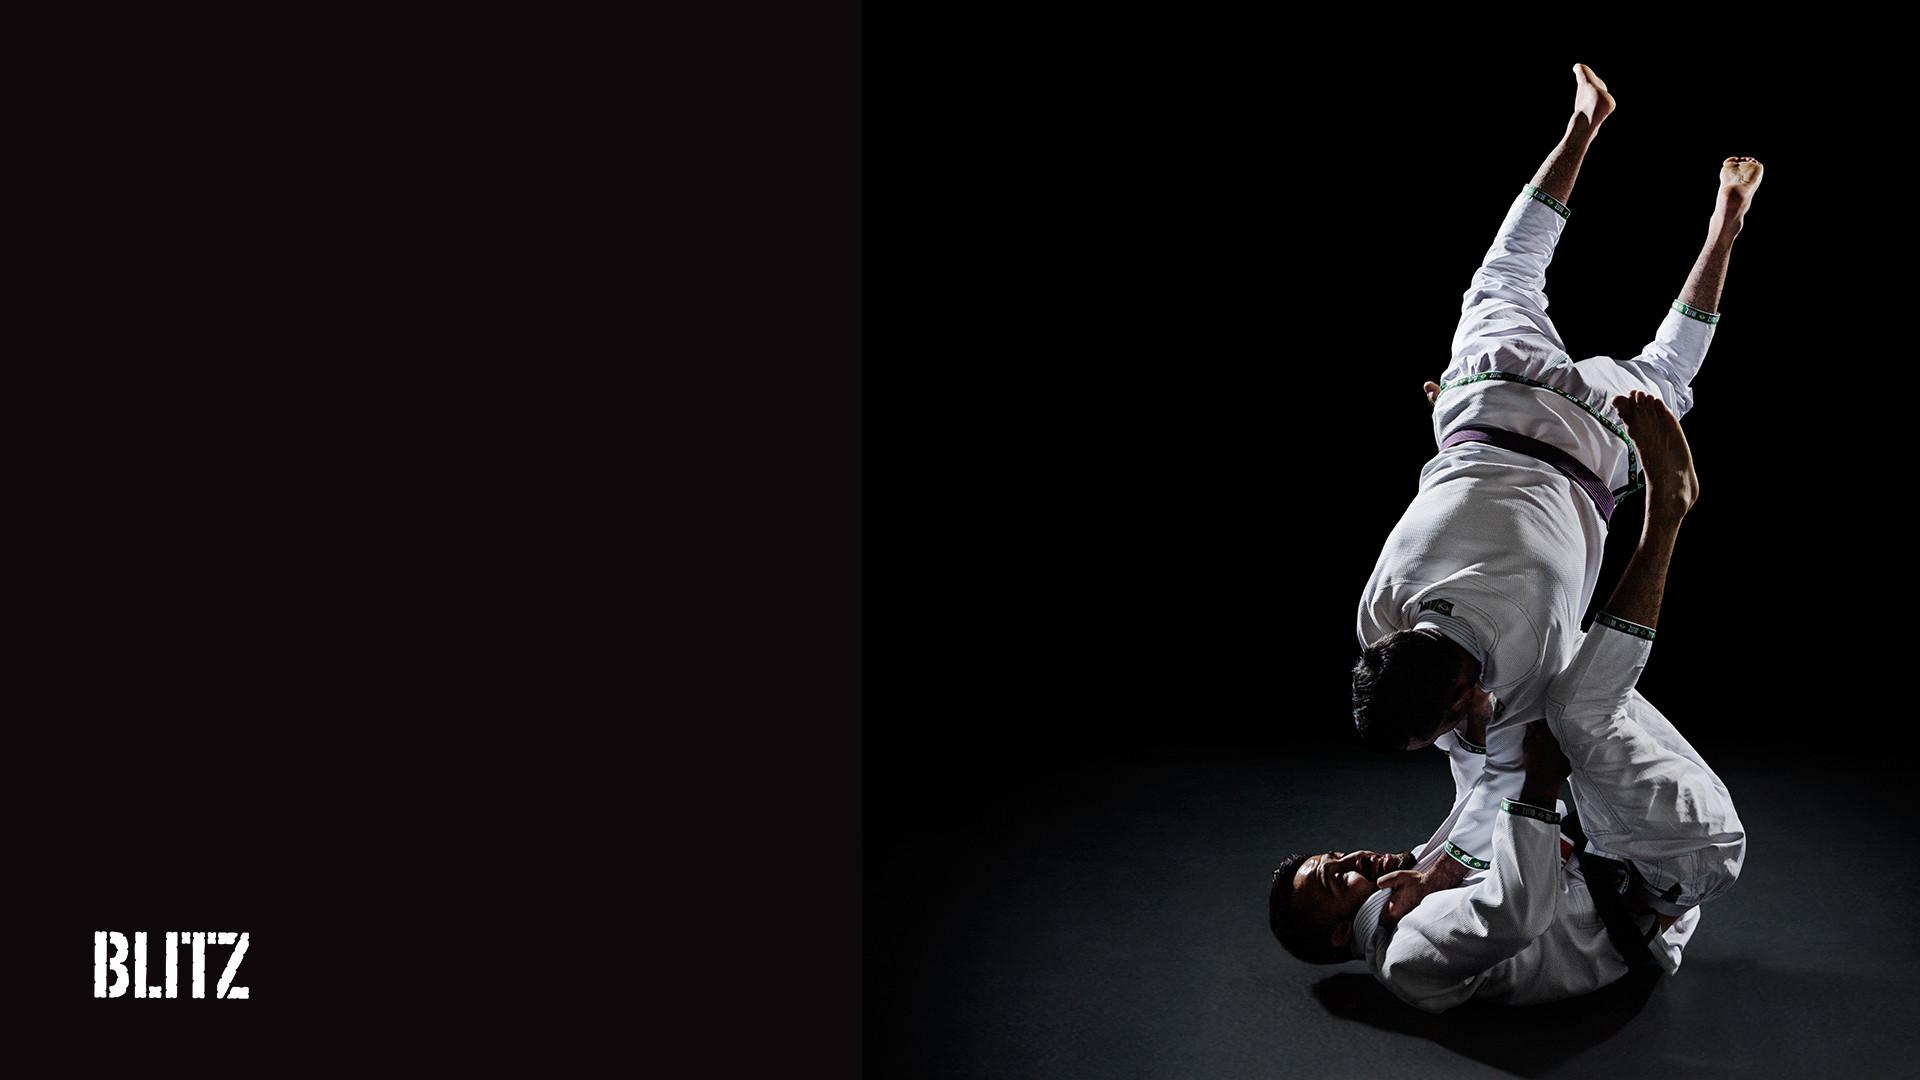 wallpaper, Muay Thai wallpaper, Kung Fu wallpaper and Judo wallpaper .